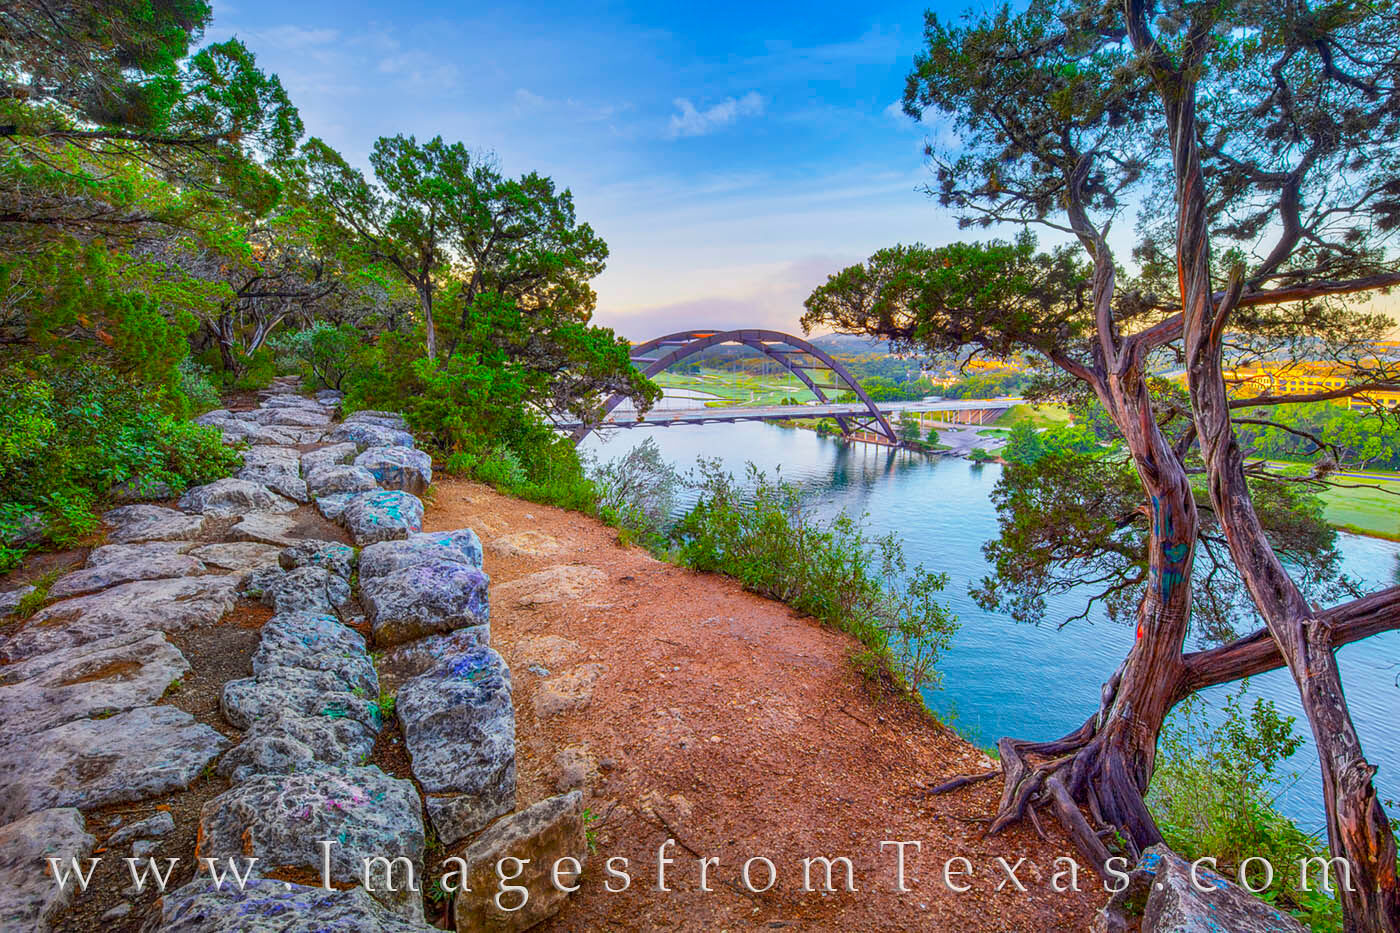 360 bridge, pennybacker bridge, morning, clouds, sunrise, summer, austin icons, austin texas, bridges, colorado river, photo